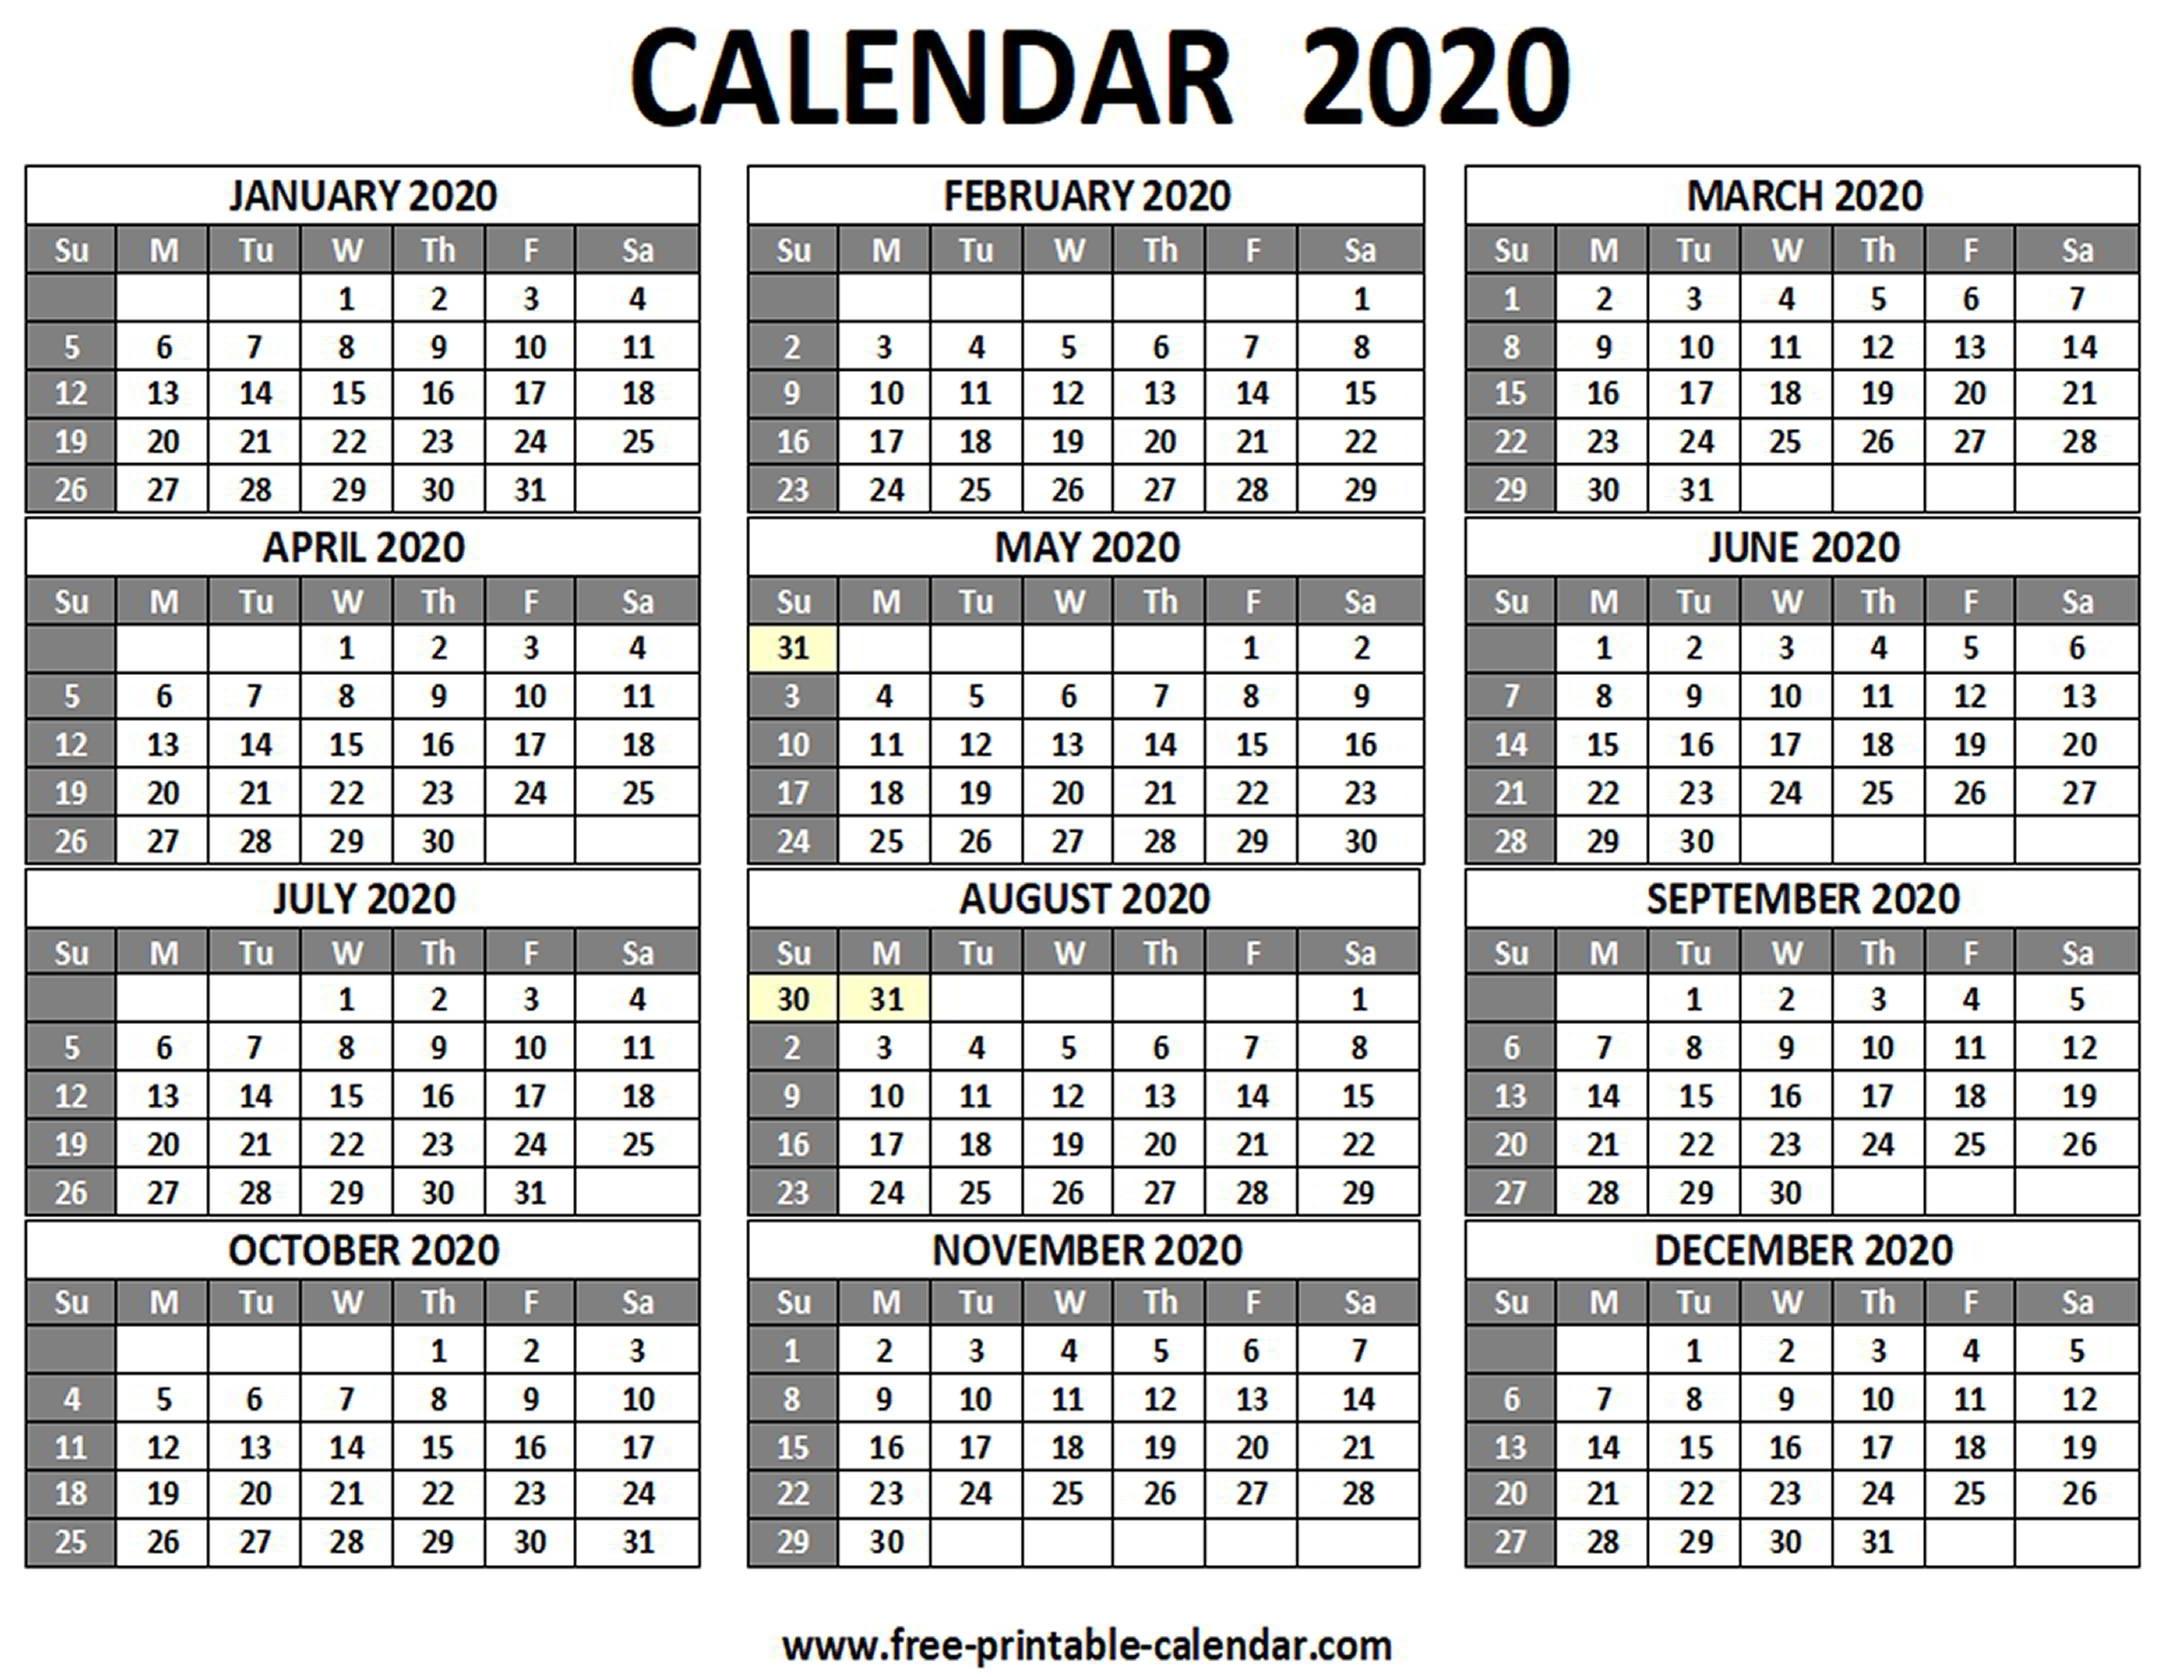 Printable 2020 Calendar - Free-Printable-Calendar